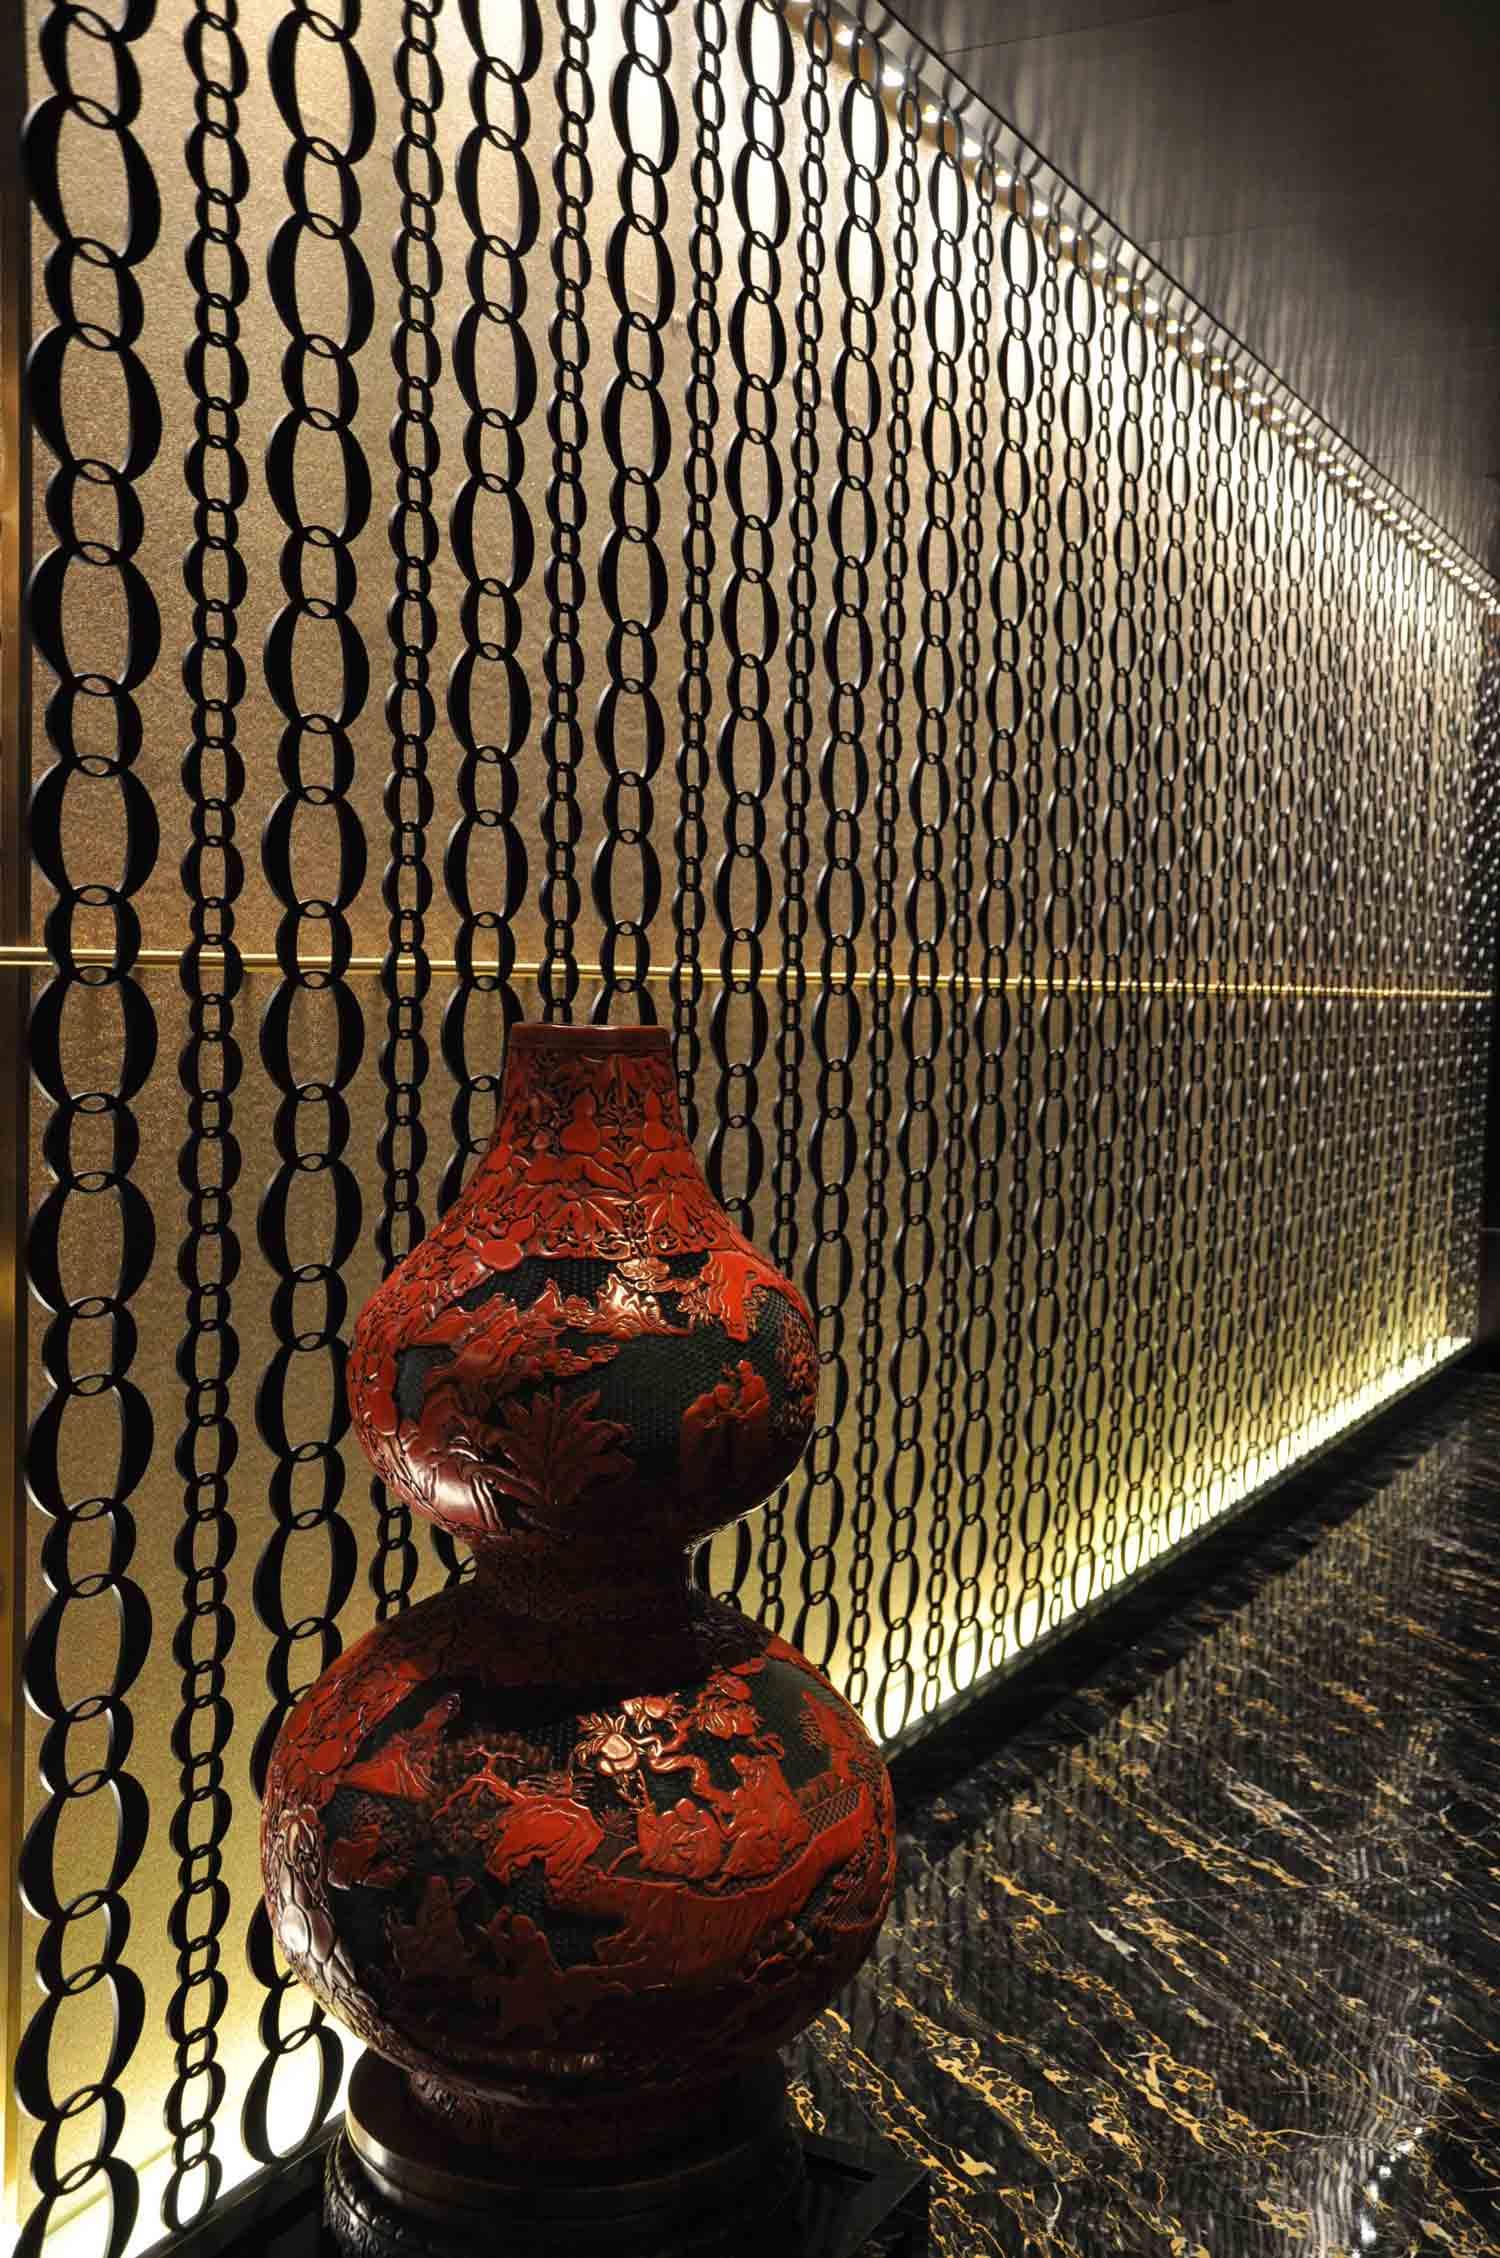 8 Restaurant Macau dangling chains